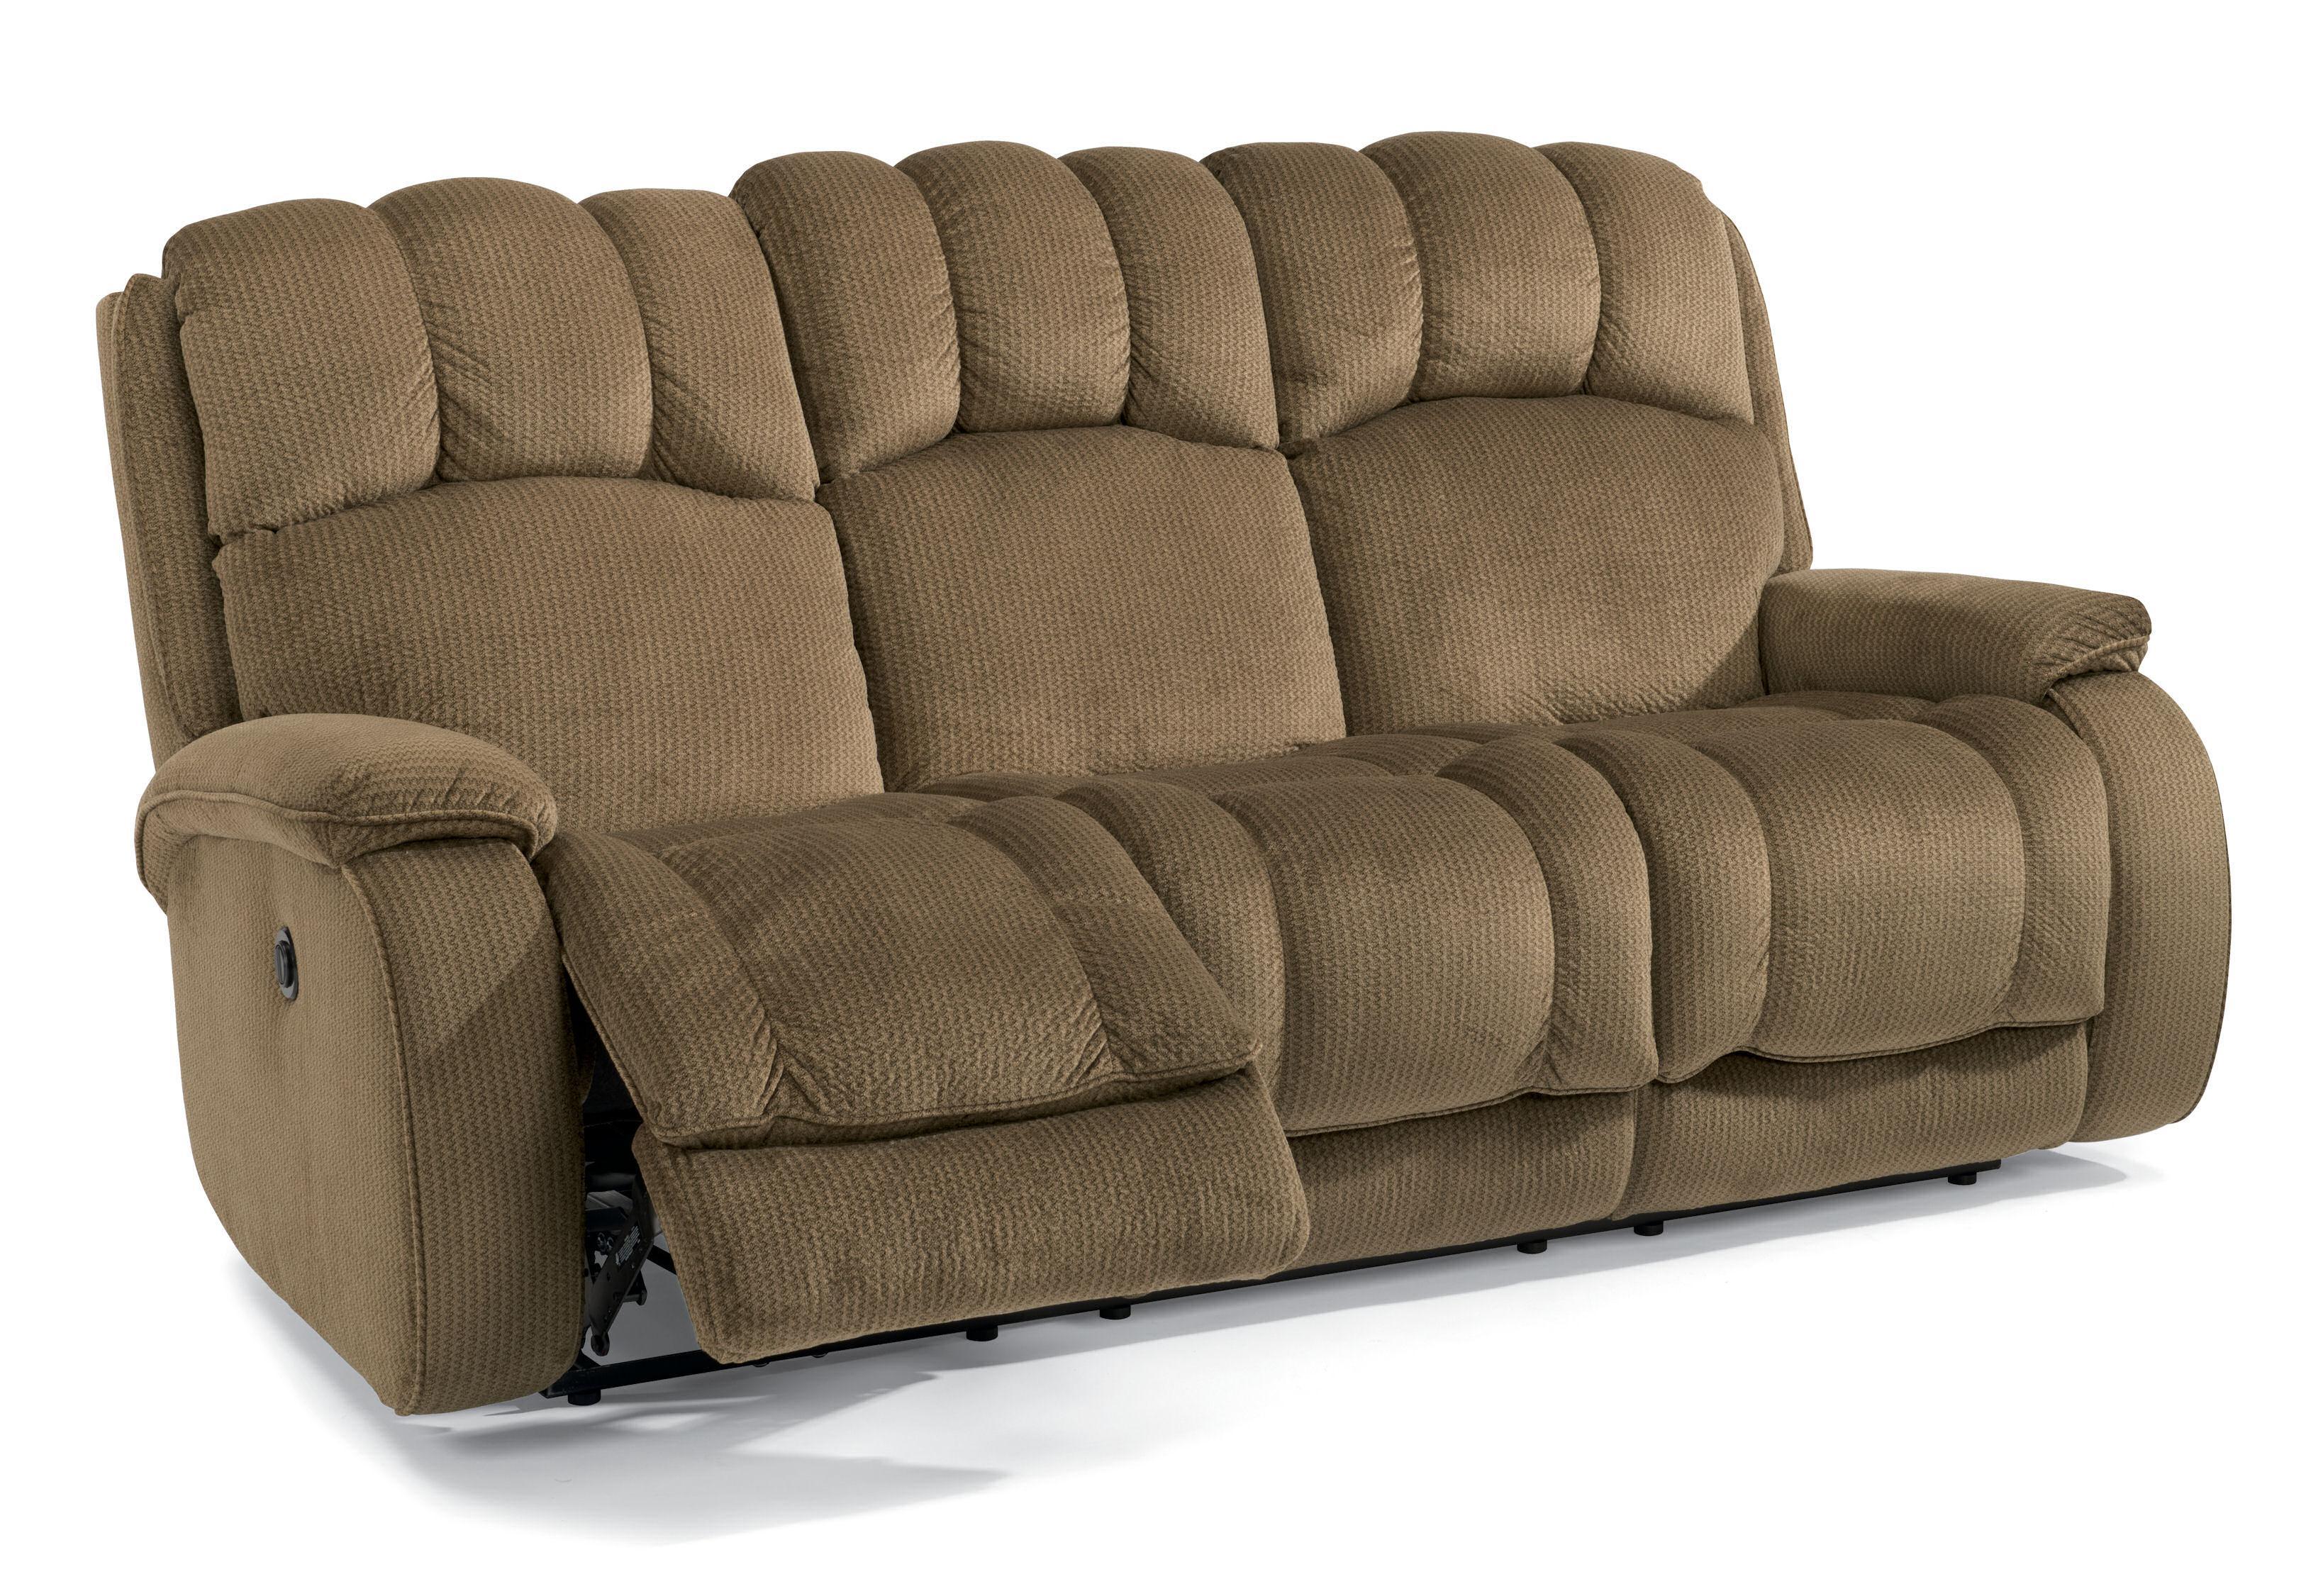 flexsteel reclining sofa warranty sack bean bags bag chair 3 charcoal huron casual power with plush